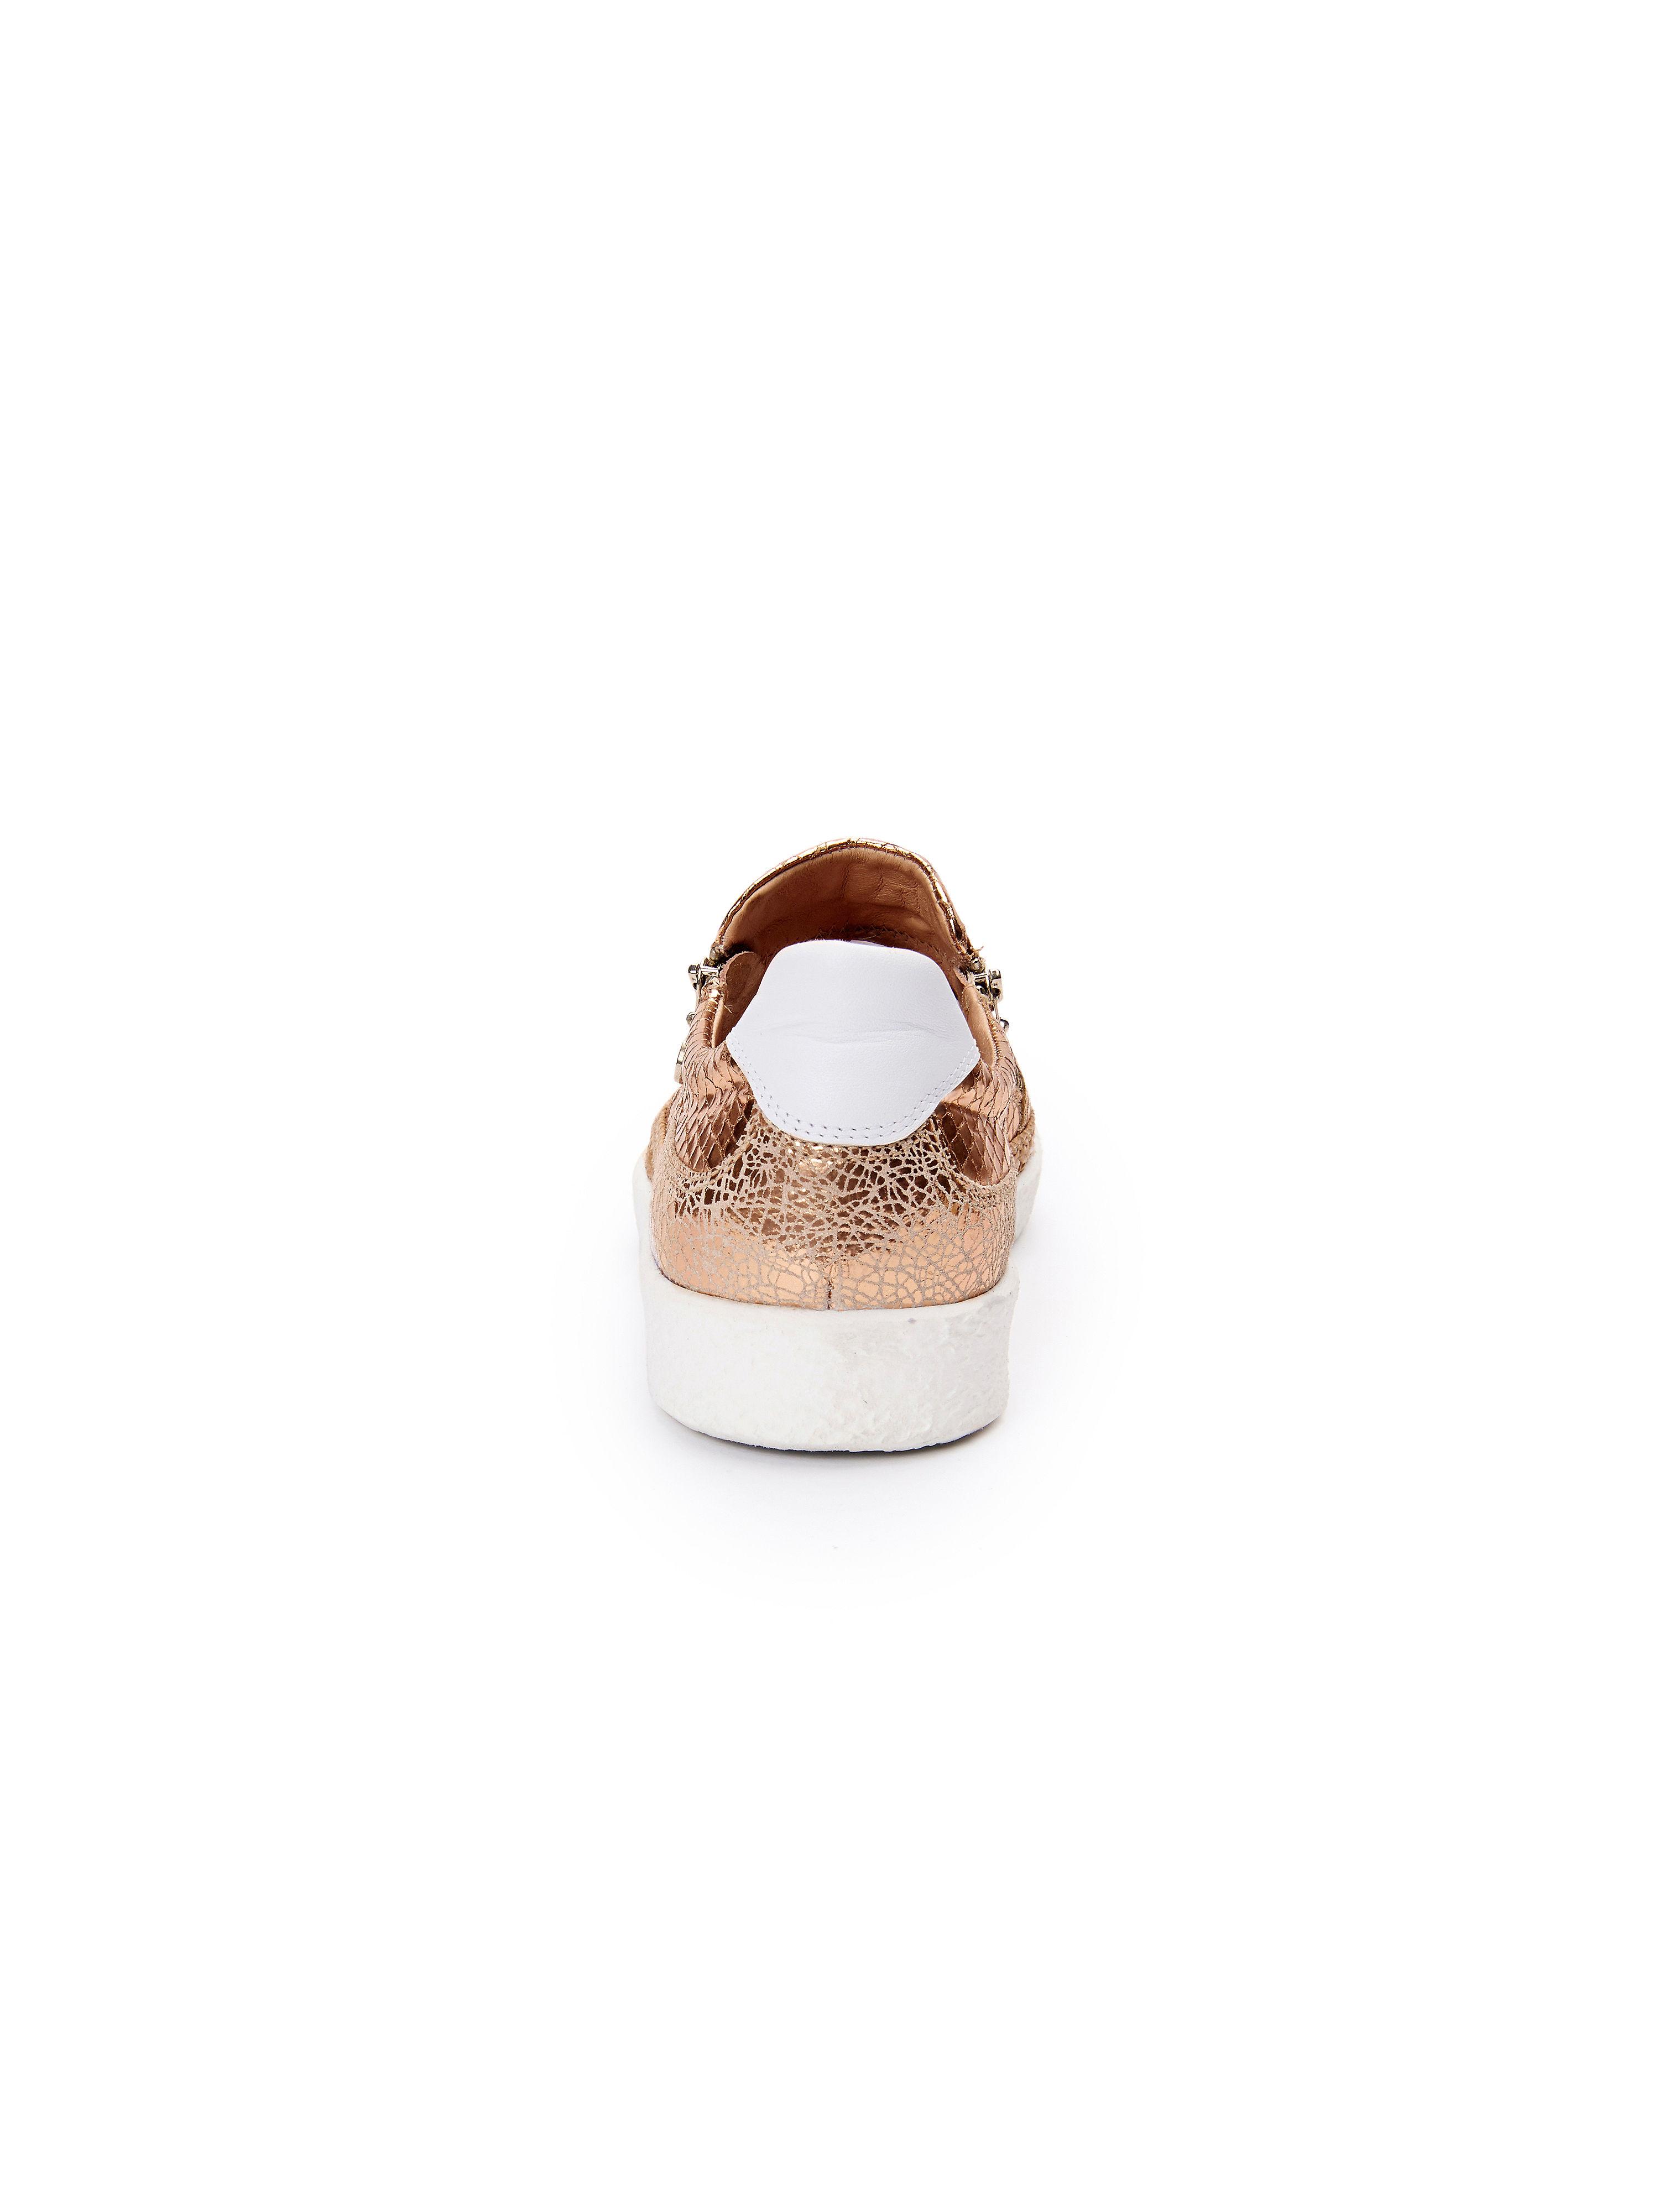 Softwaves - Slipper - Rose-Metallic/Weiß Schuhe Gute Qualität beliebte Schuhe Rose-Metallic/Weiß ff8230